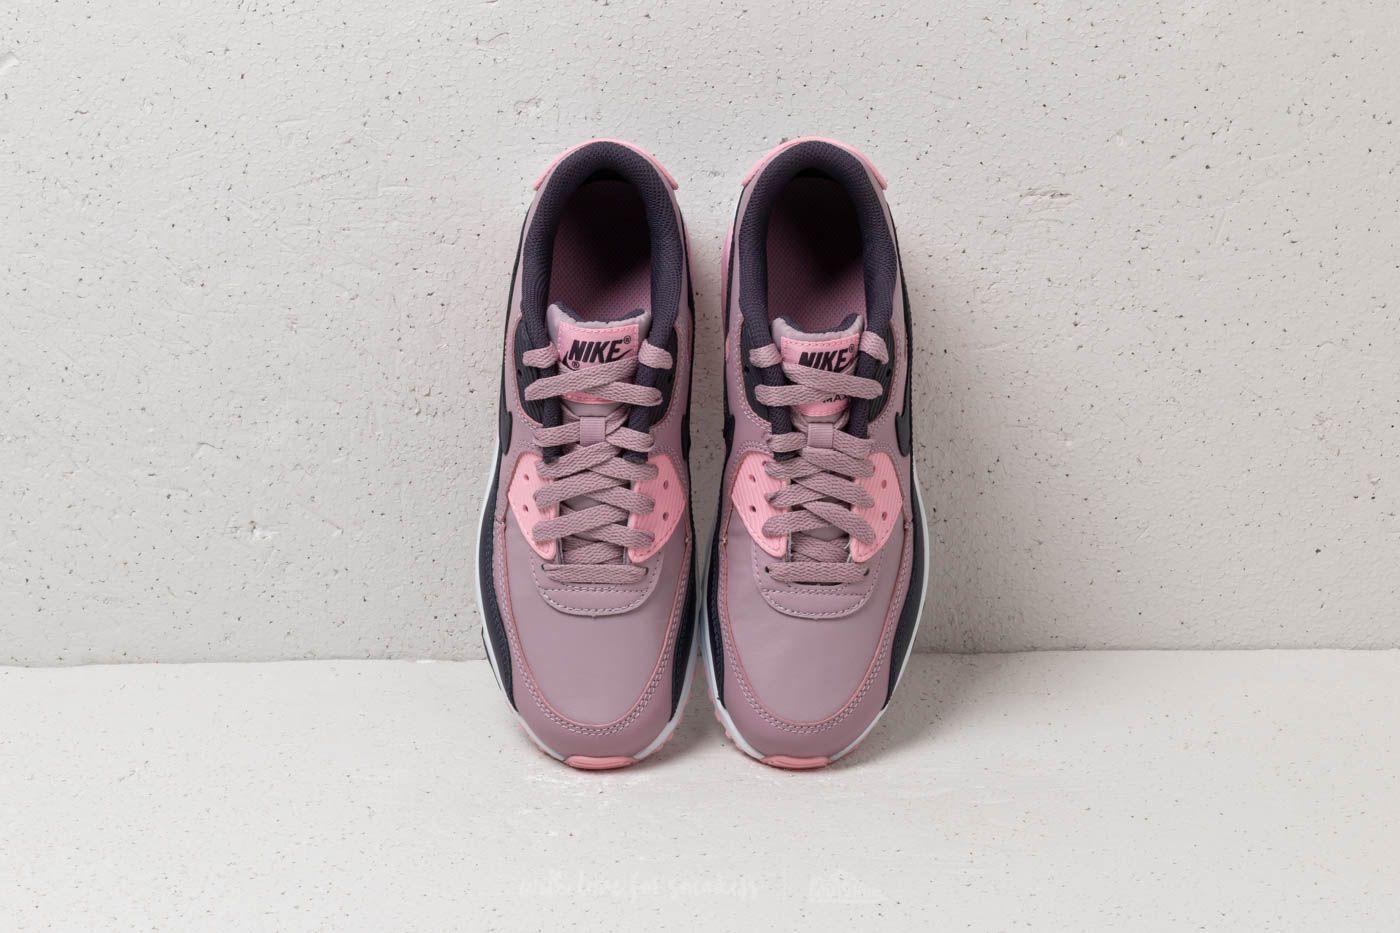 nouveau style 8d065 6cf9b Nike Air Max 90 Leather (GS) Elemental Rose/ Gridiron-Pink ...